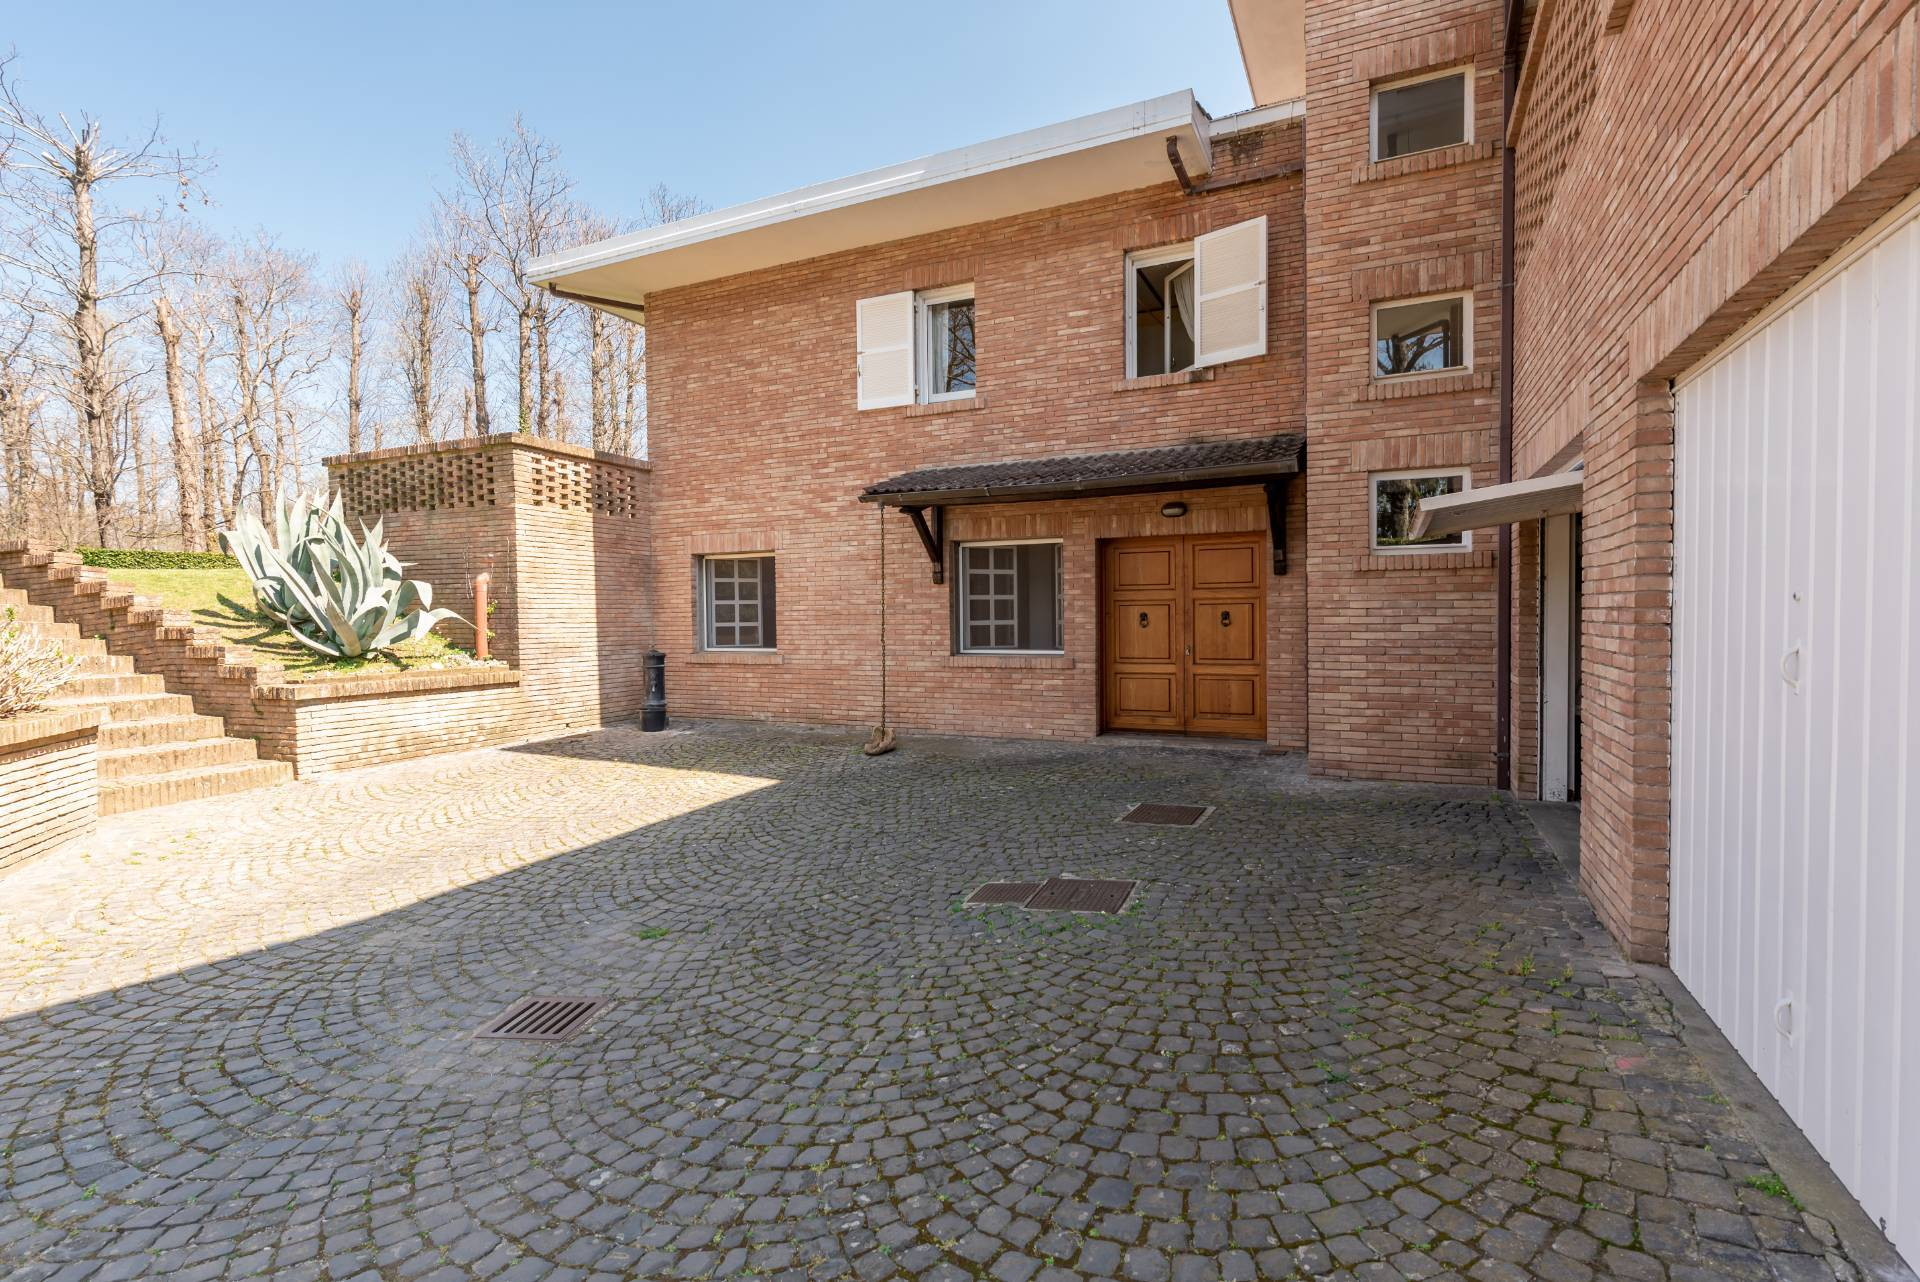 Villa in Vendita a Ariccia: 5 locali, 583 mq - Foto 18